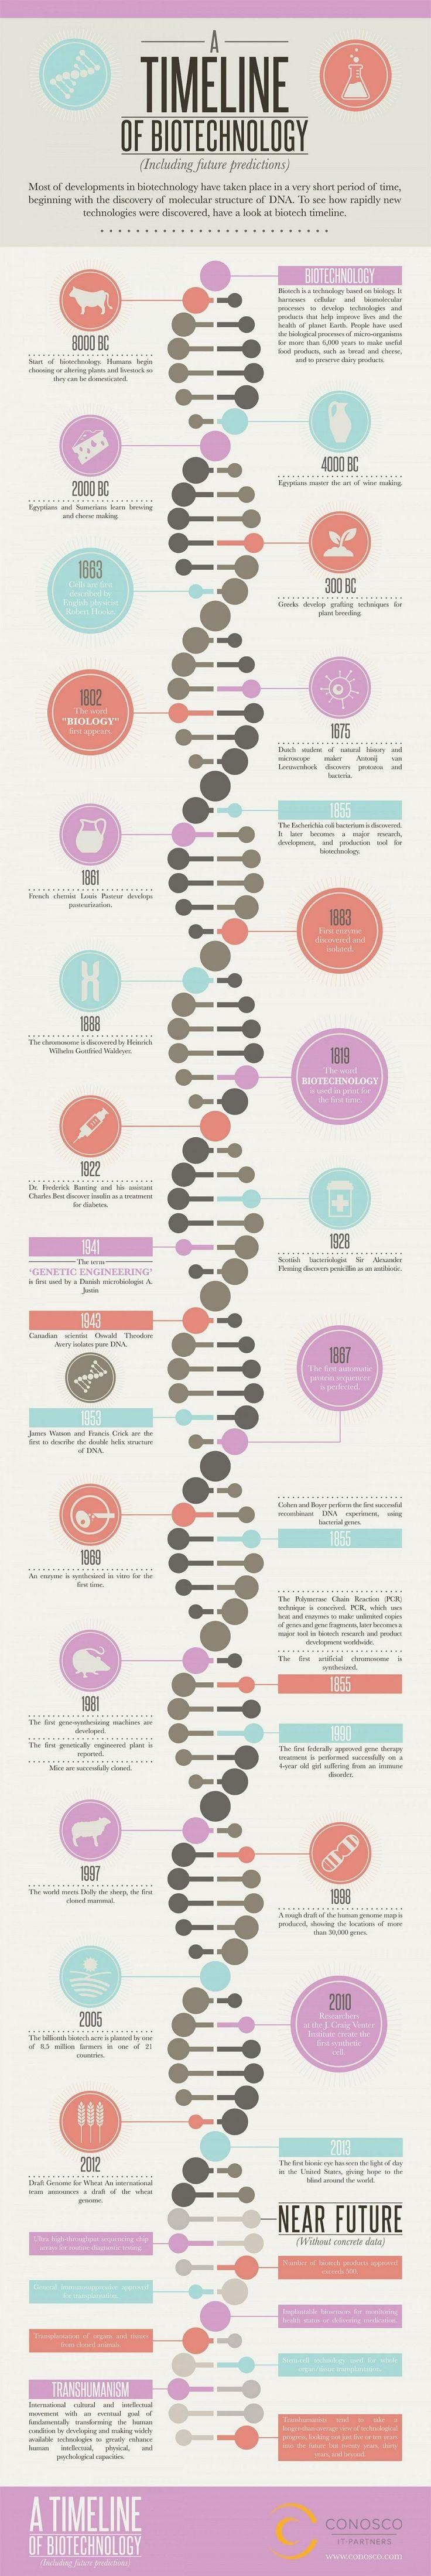 25 beste idee n over frise chronologique op pinterest - Table nationale de codage de biologie ...